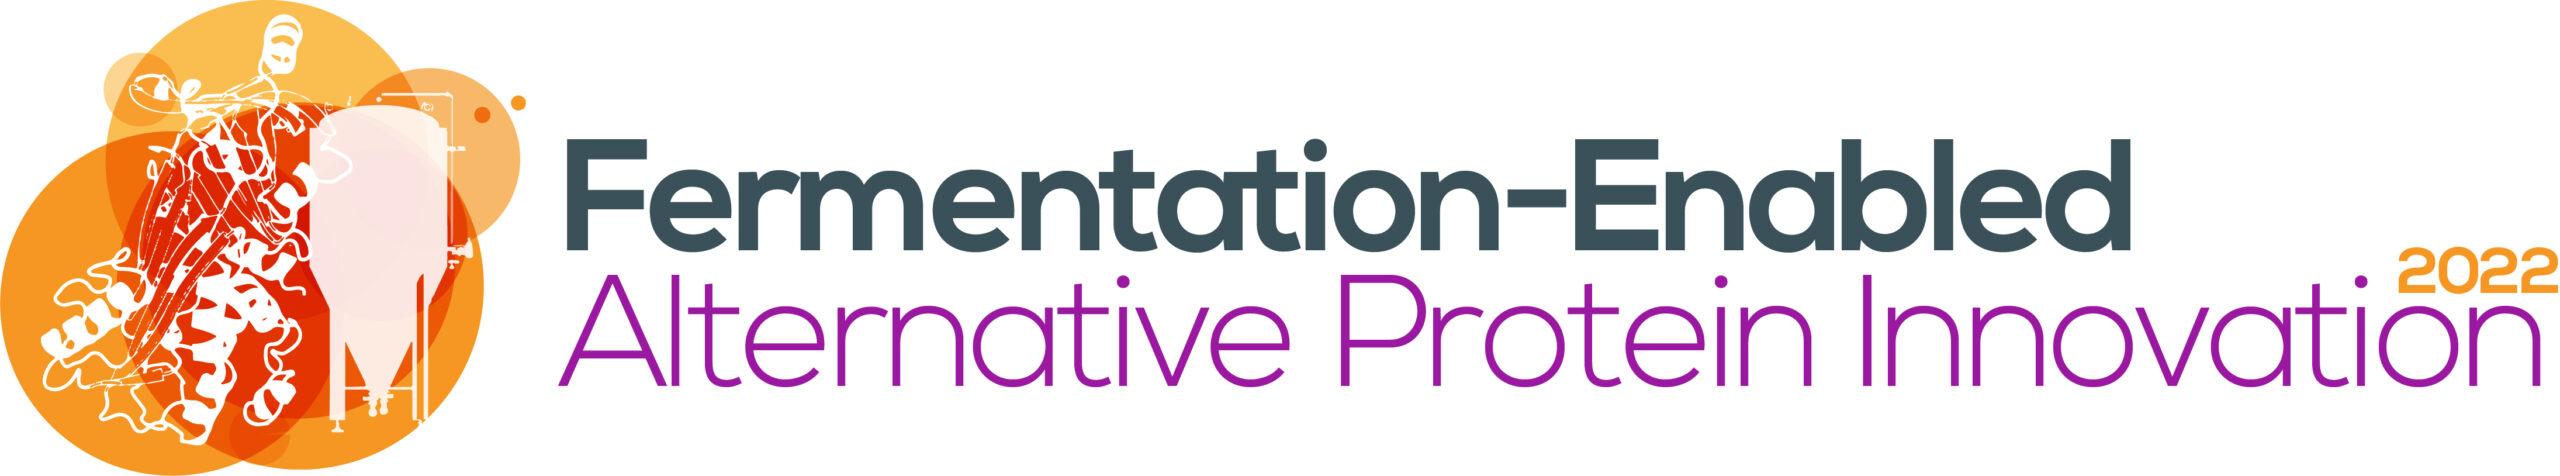 Fermentation-Enabled Alternative Protein Innovation logo FINAL